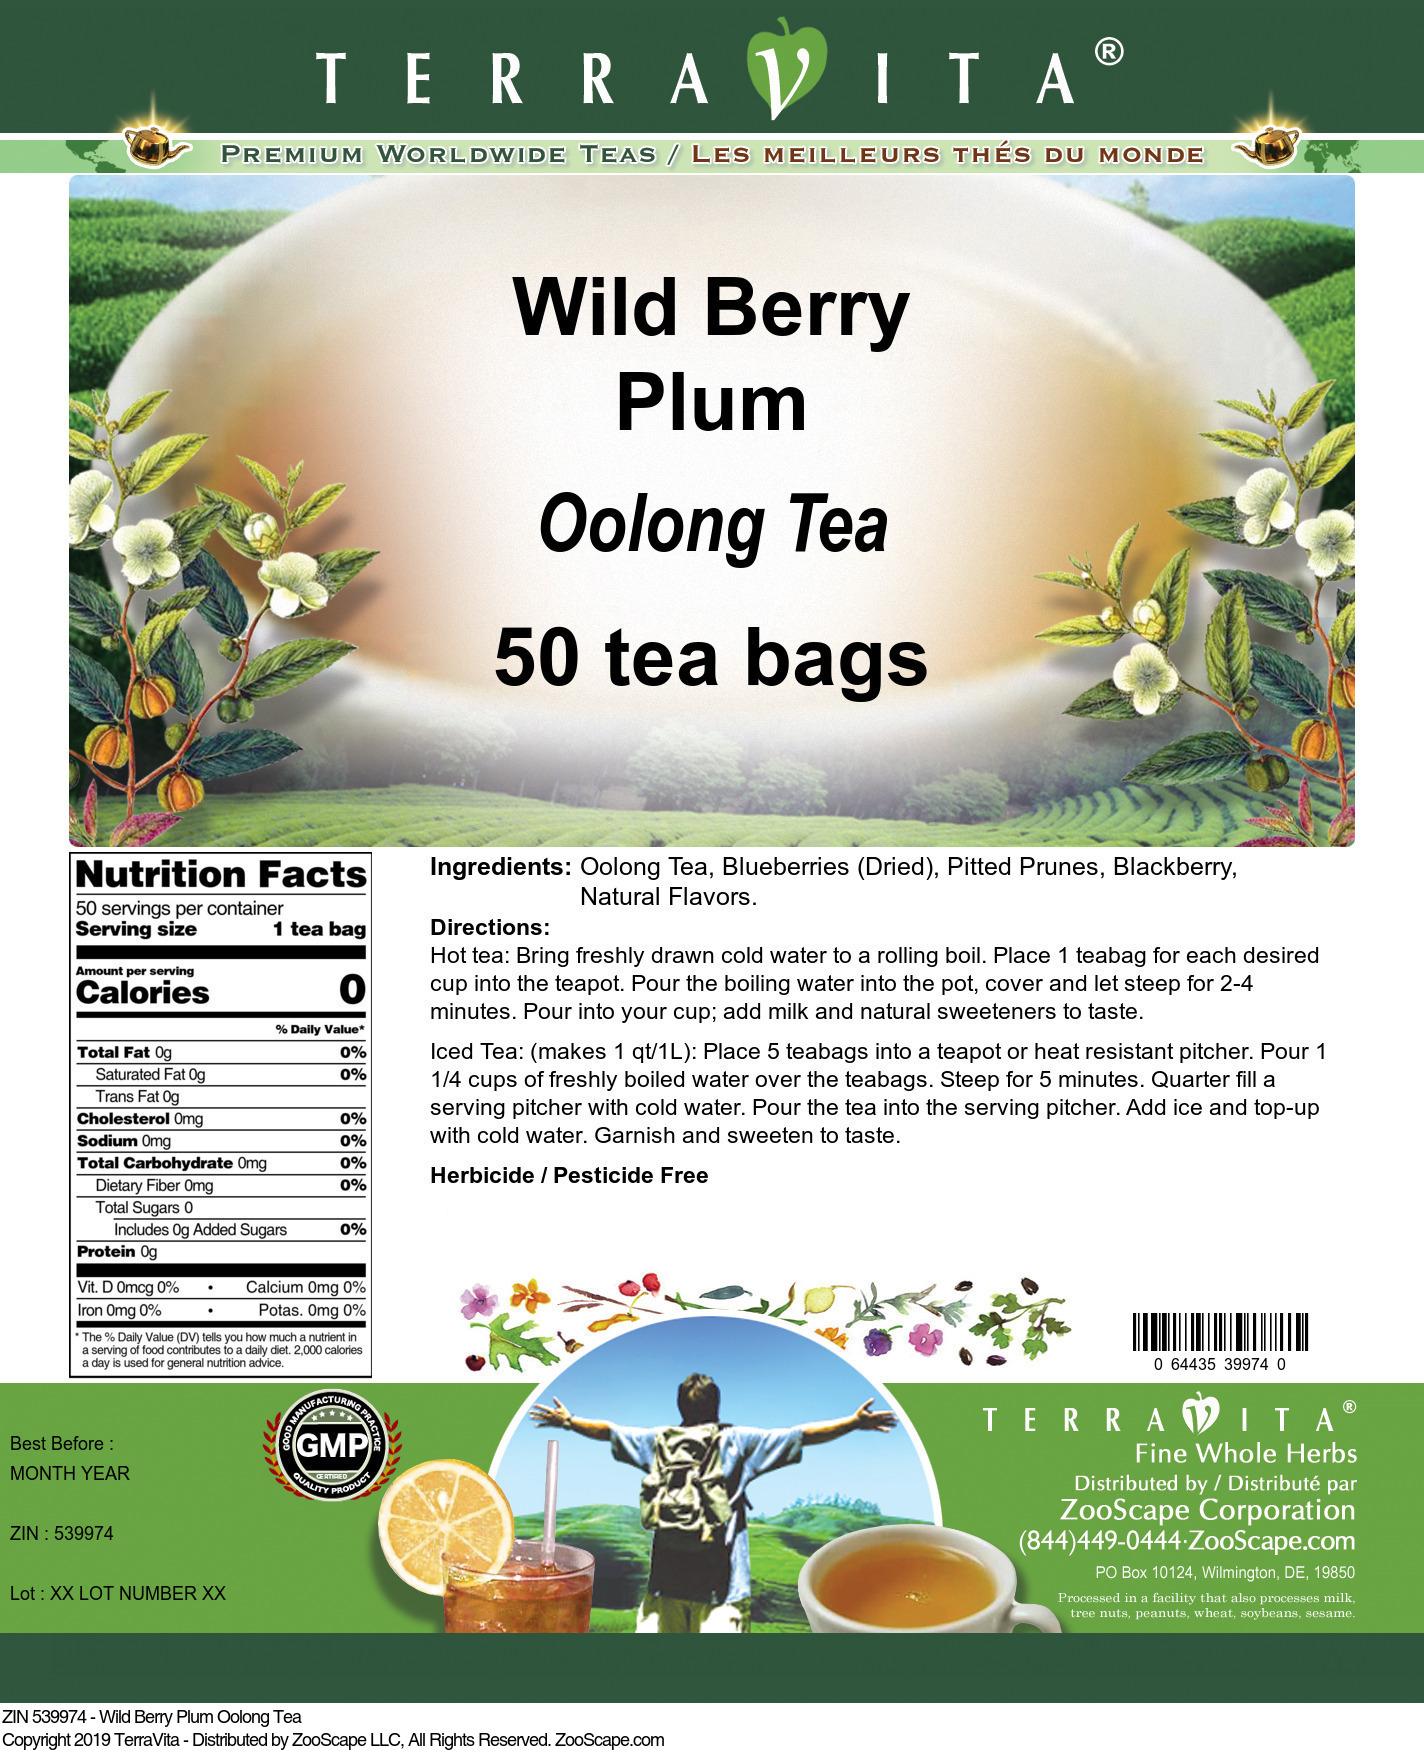 Wild Berry Plum Oolong Tea